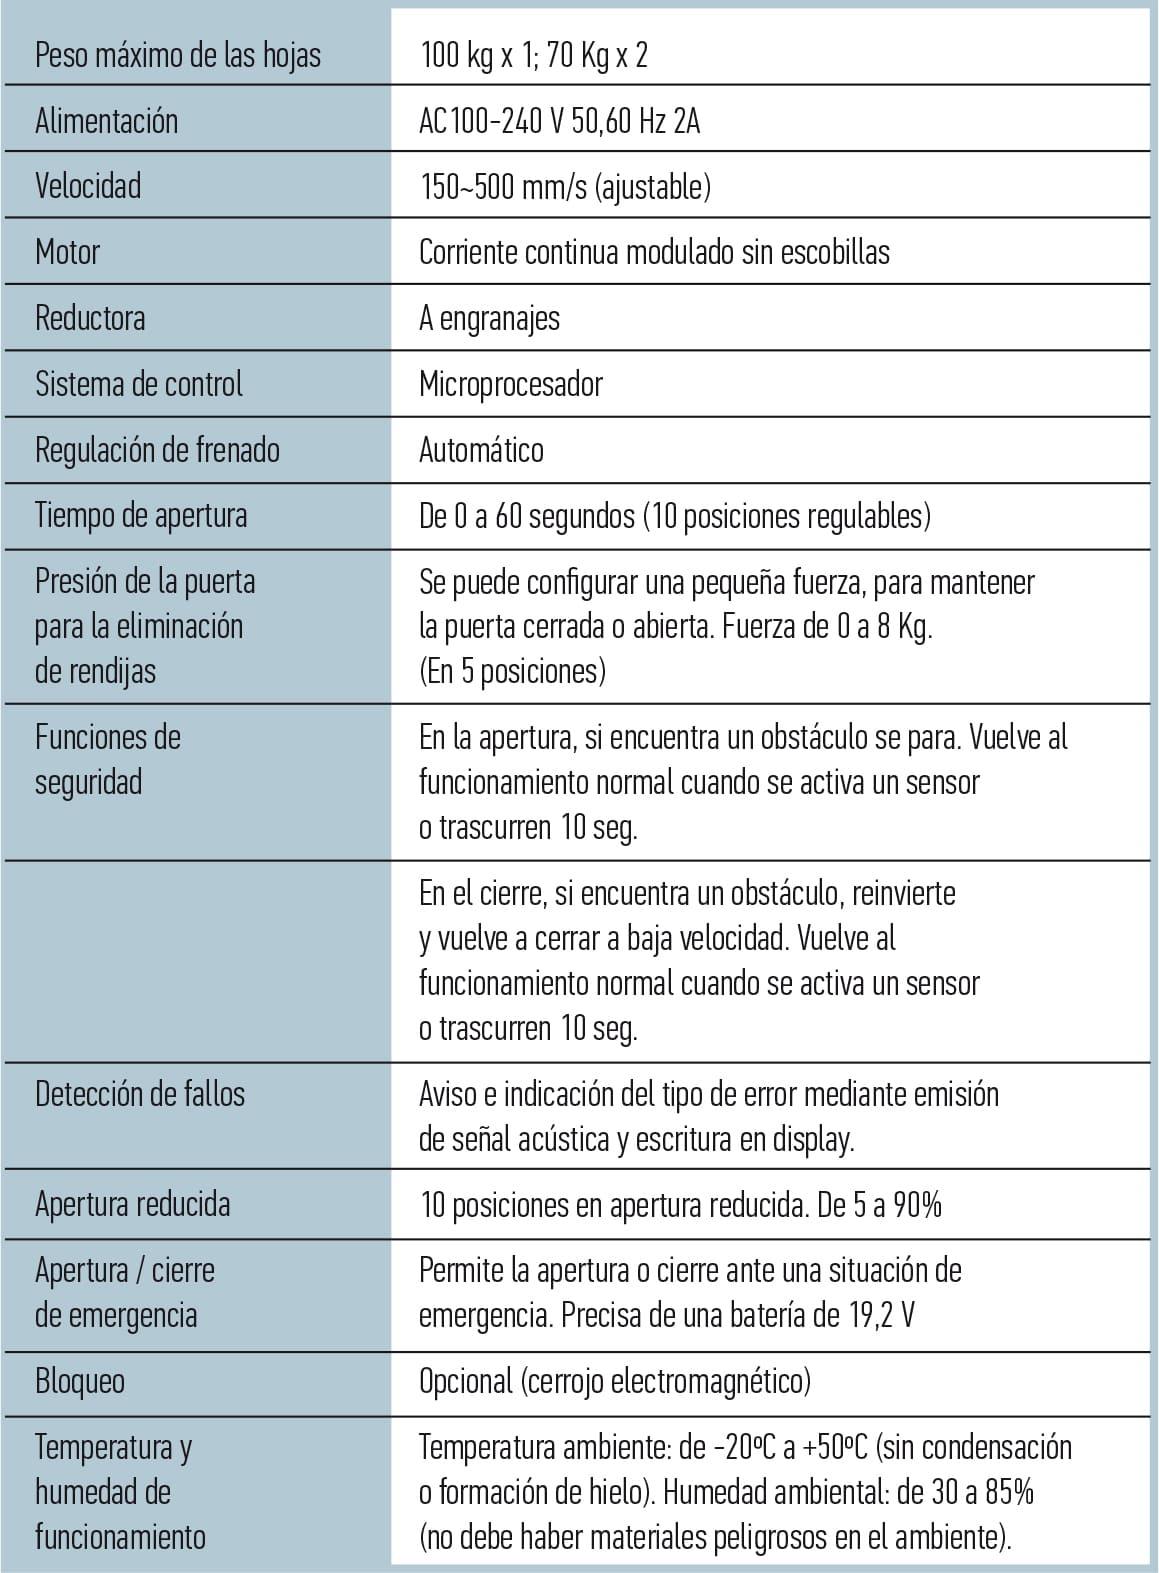 caracteristicas-basicsl